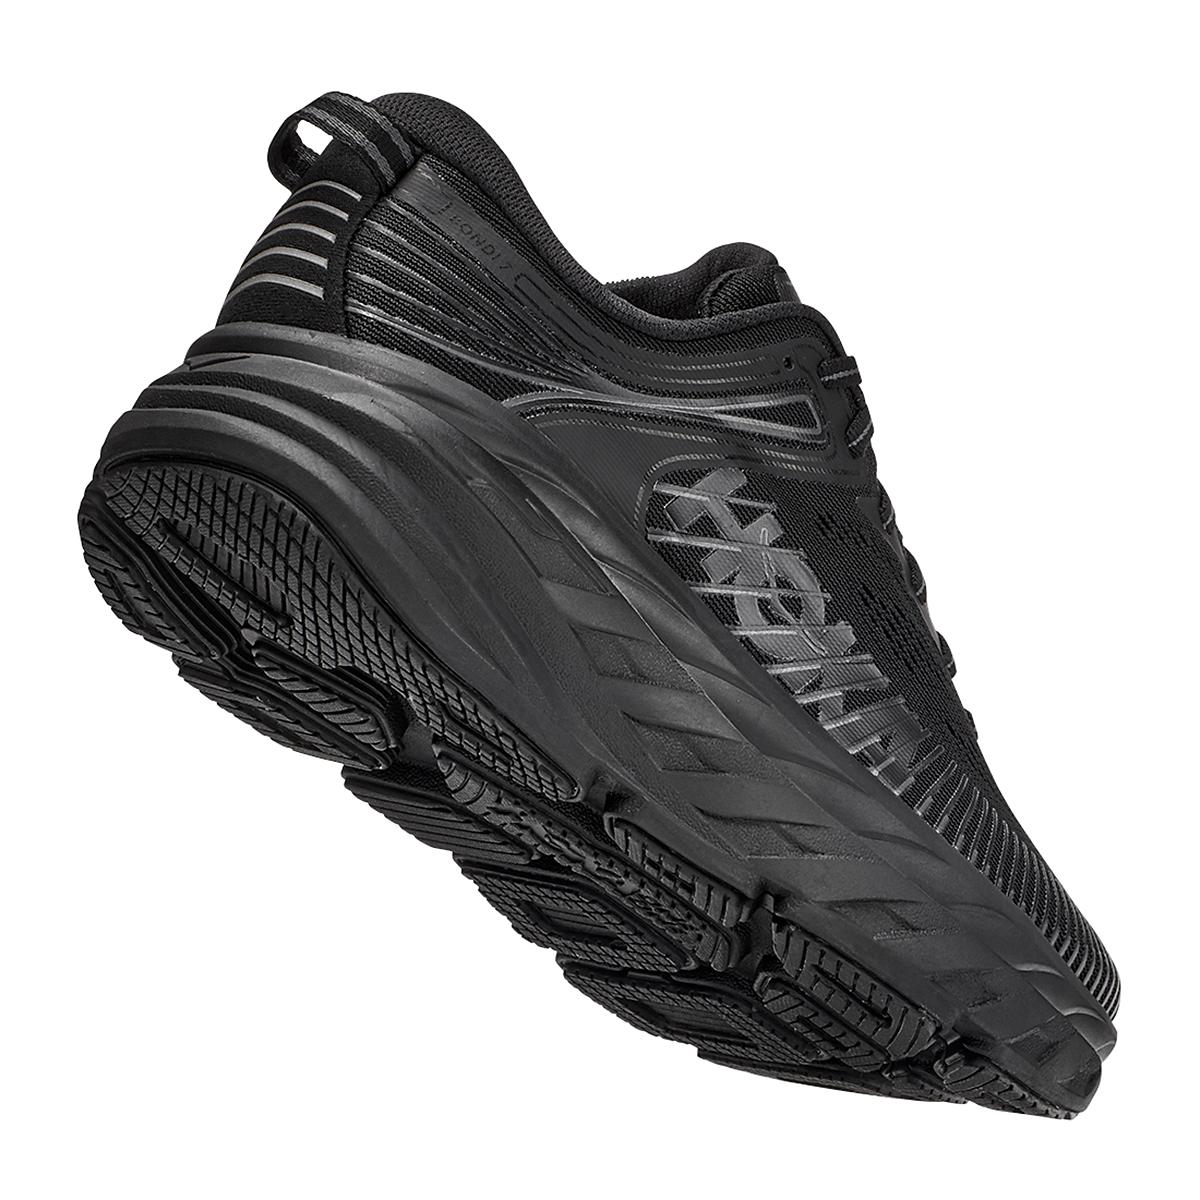 Women's Hoka One One Bondi 7 Running Shoe - Color: Black - Size: 5 - Width: Regular, Black, large, image 3